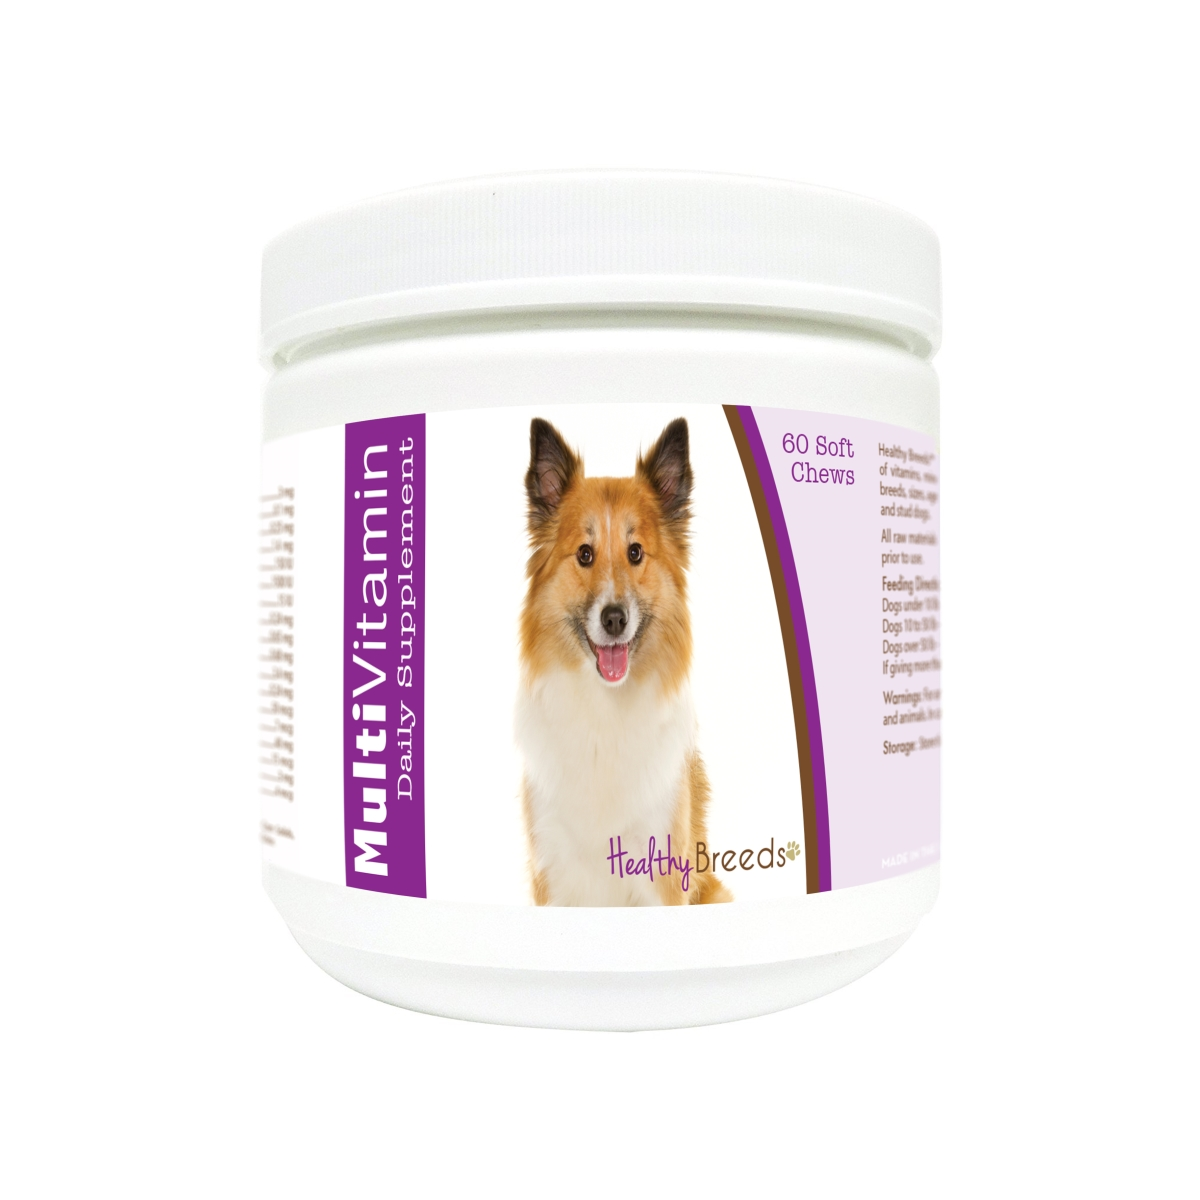 Healthy Breeds 840235172260 Icelandic Sheepdog Multi-Vitamin Soft Chews - 60 Count